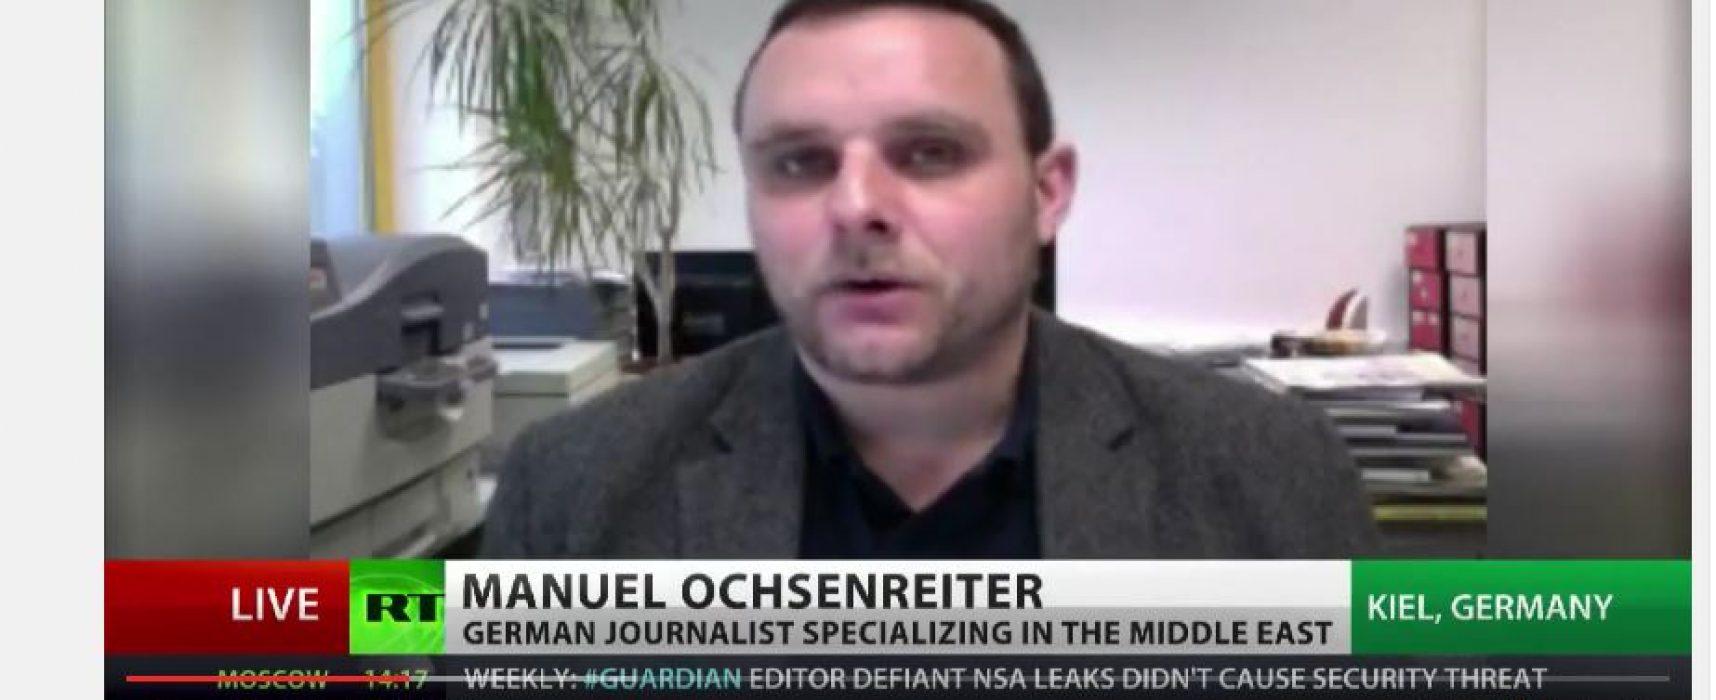 Fake: Gli osservatori internazionali: l'Ucraina ignora gli accordi di Minsk